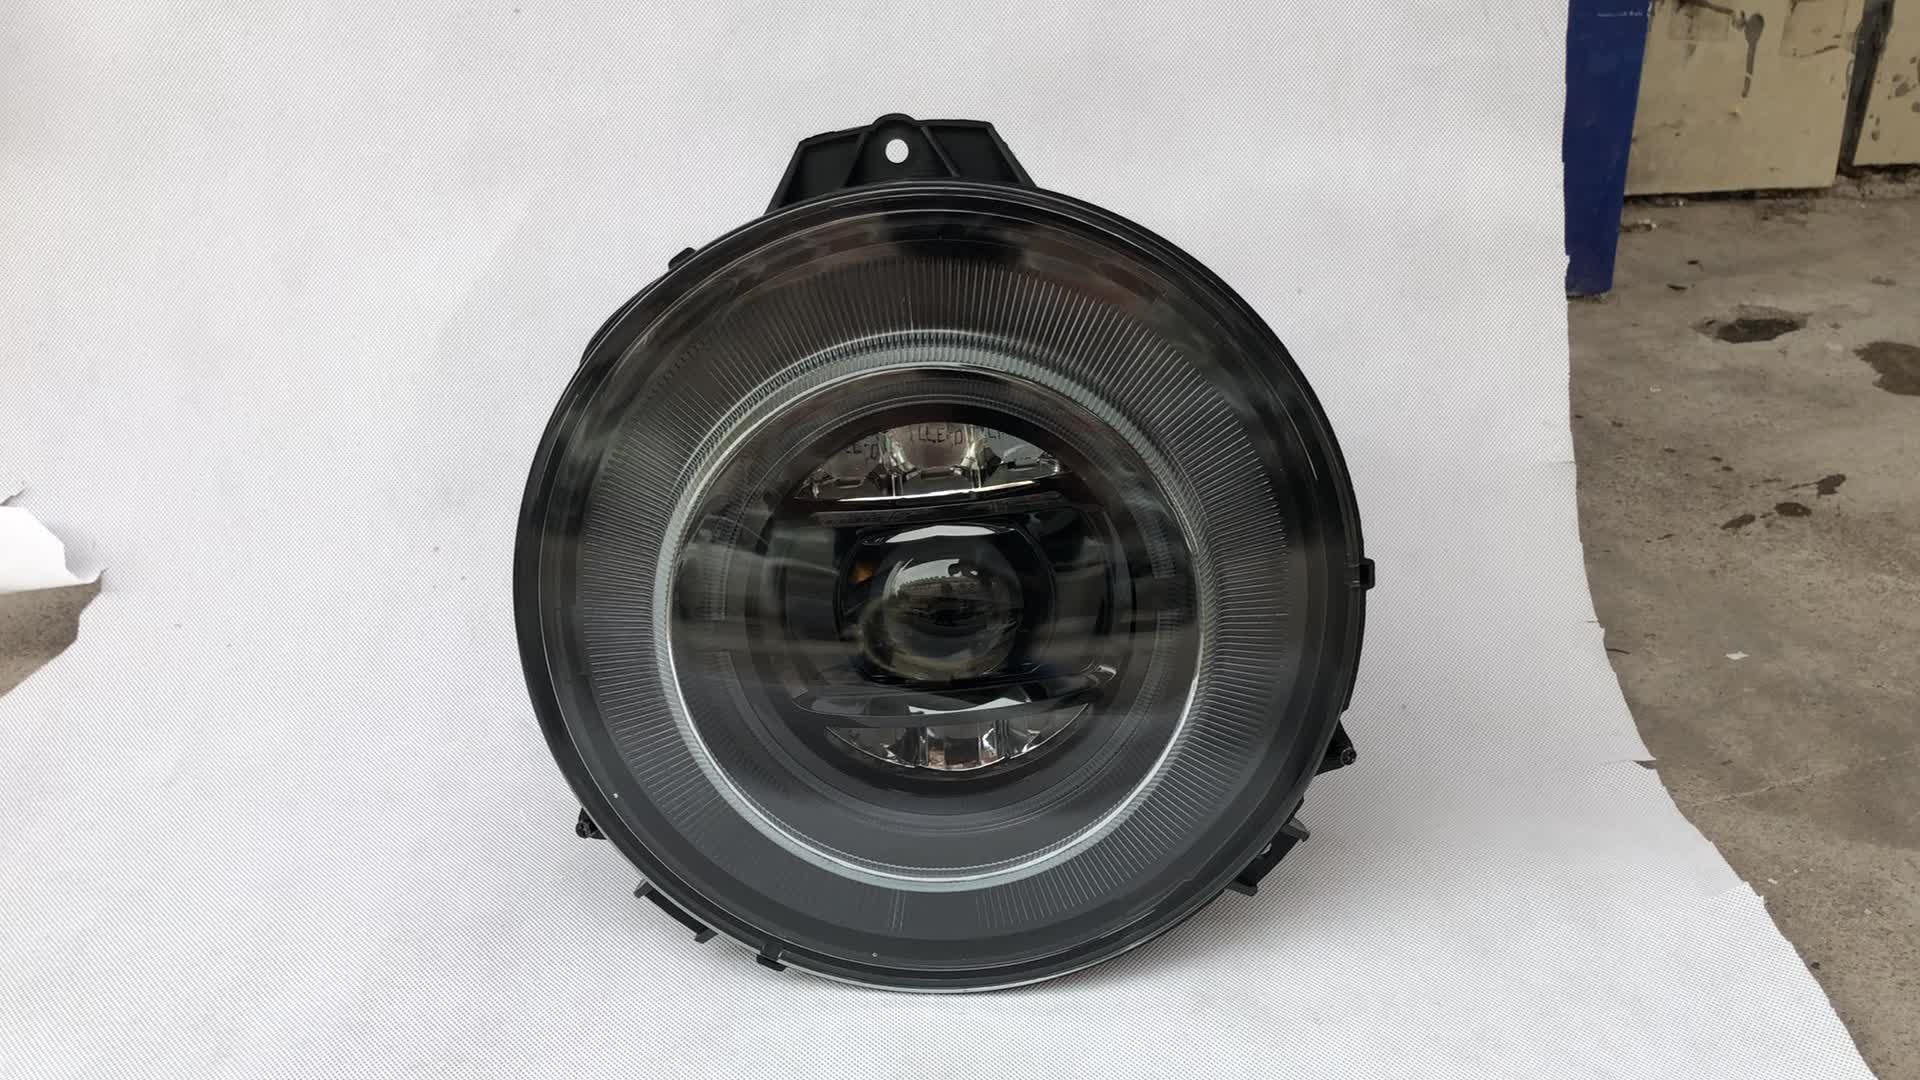 For 1989~2006 M ercedes B enz G-CLASS G65/G63 W463 Head Lamp ,Headlight,Auto Lamp,Chrome